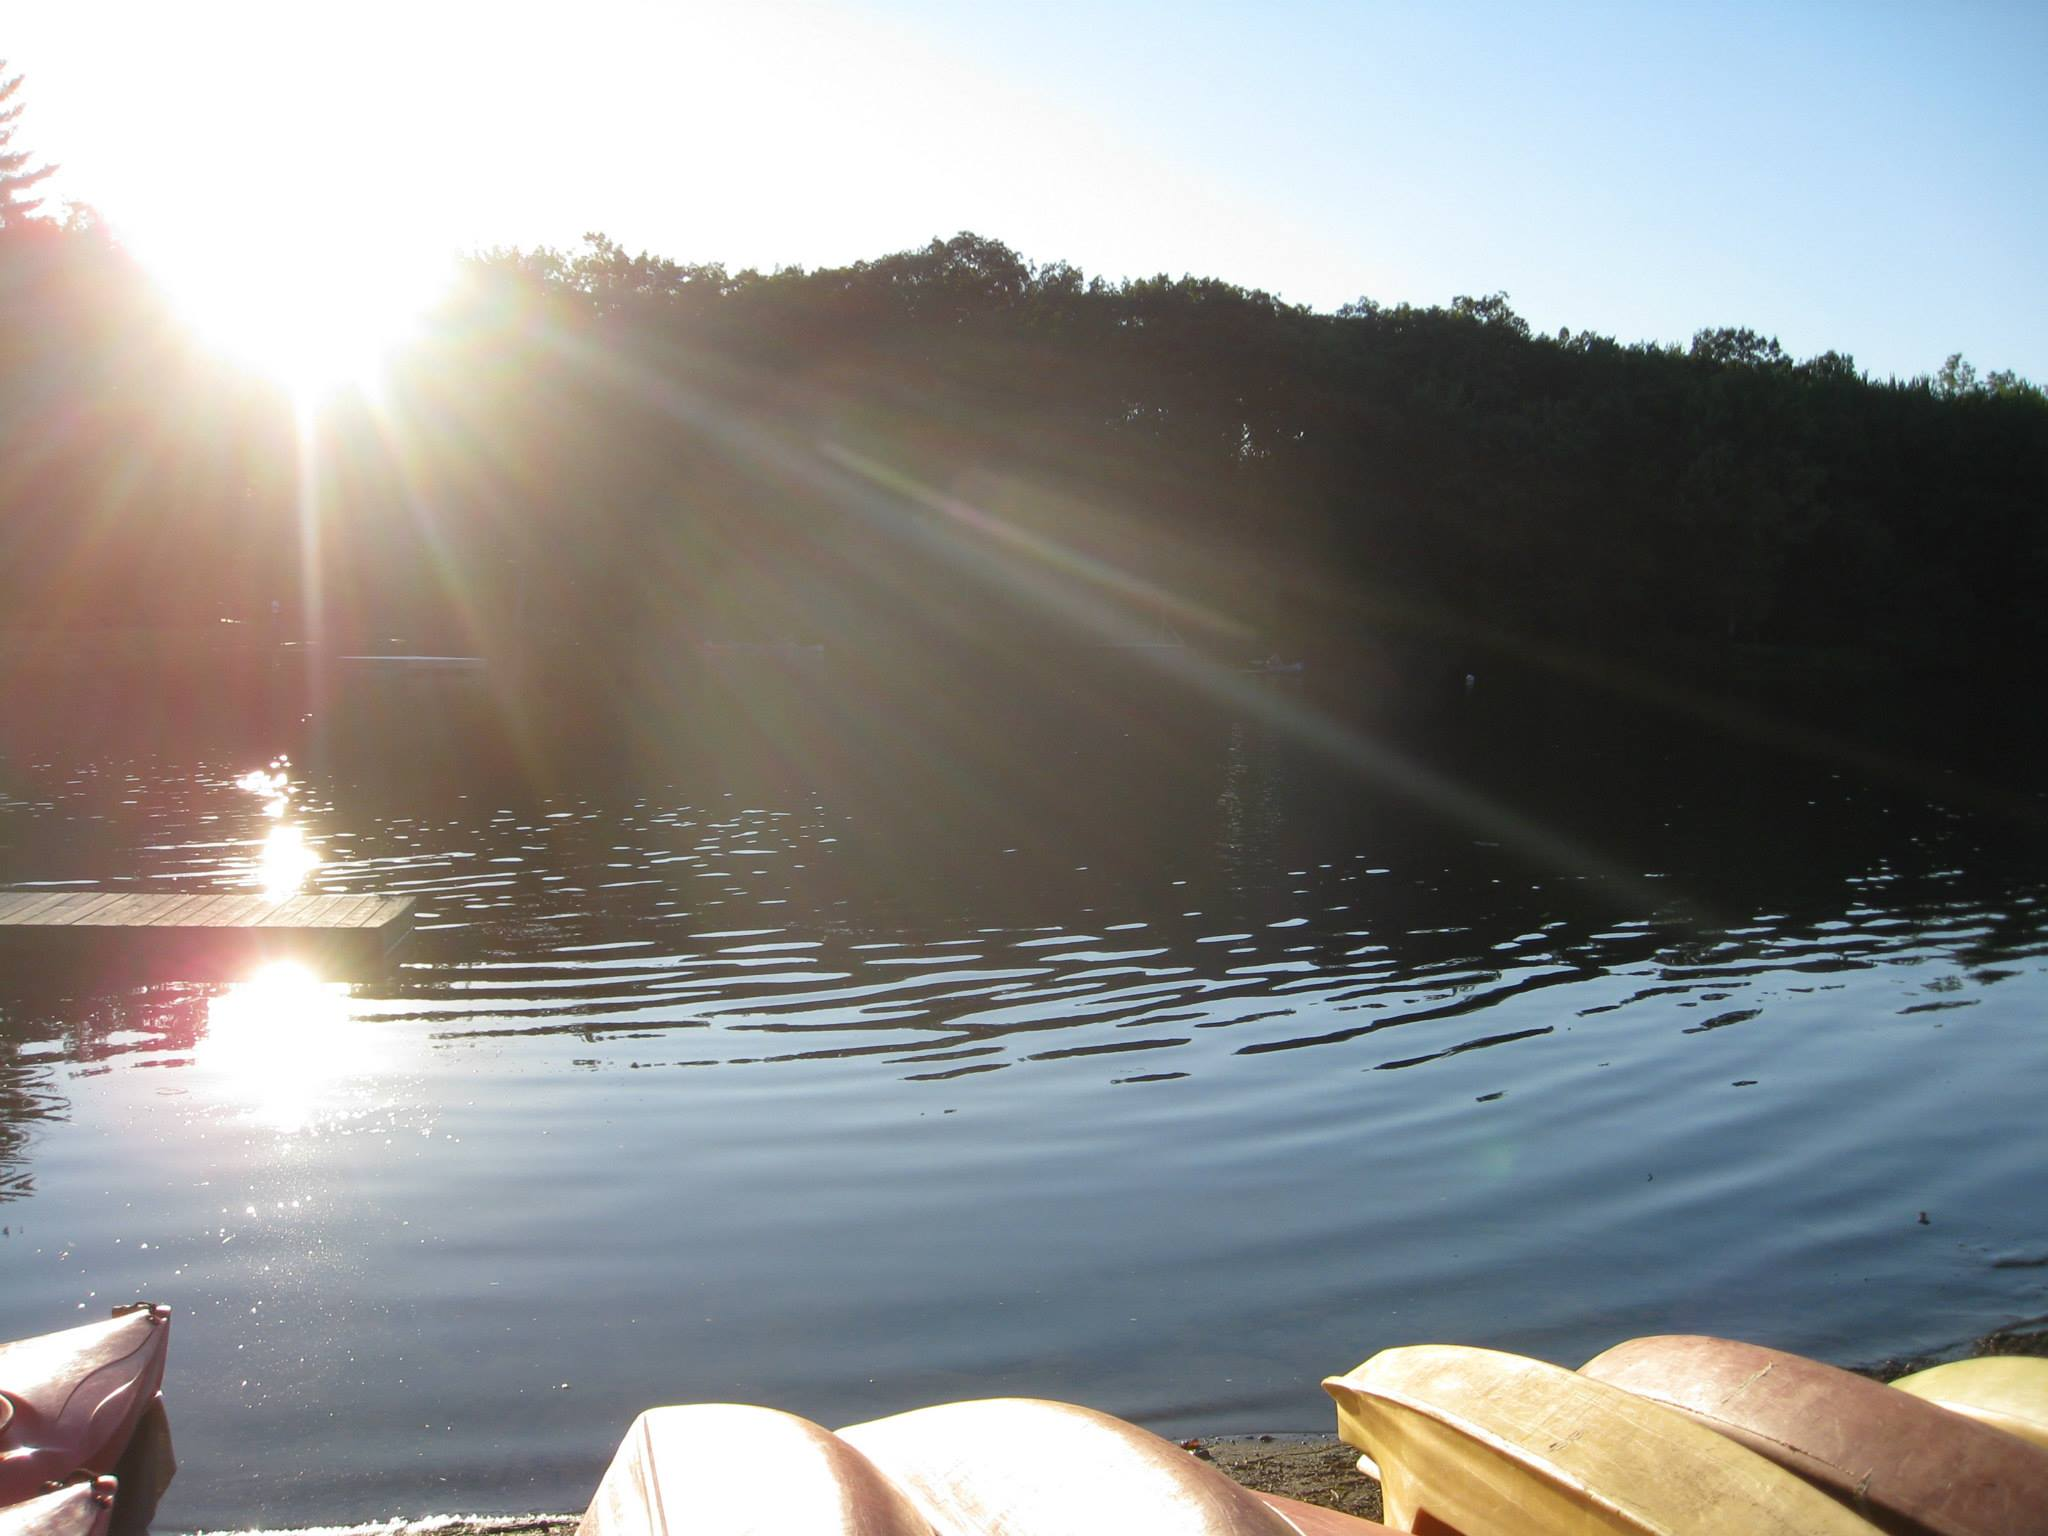 Summer Program - Water Sports | Lake Owego Camp for Boys